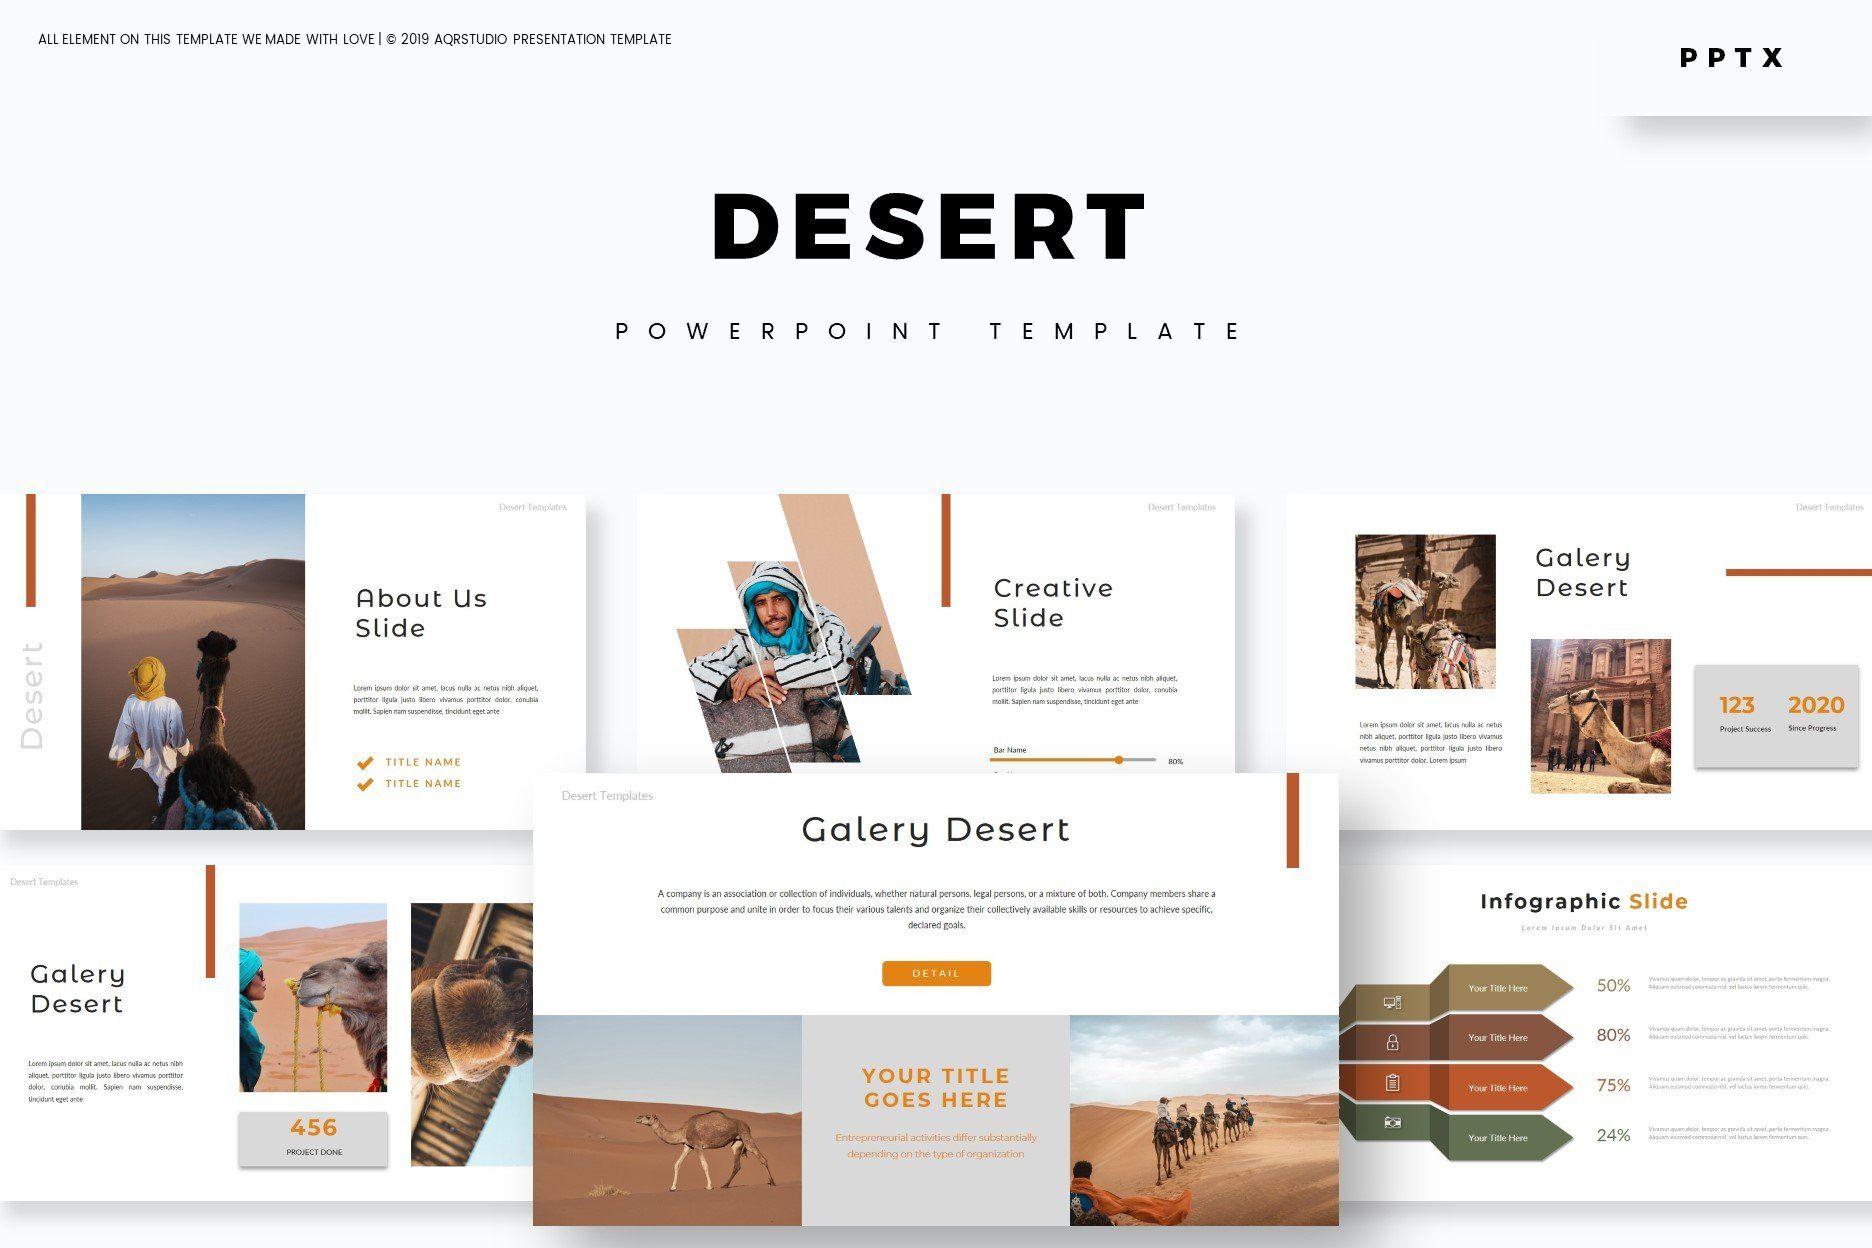 Desert Powerpoint Template By Aqr Studio On Creativemarket Powerpoint Powerpointtemp In 2020 Powerpoint Template Free Powerpoint Templates Powerpoint Presentation